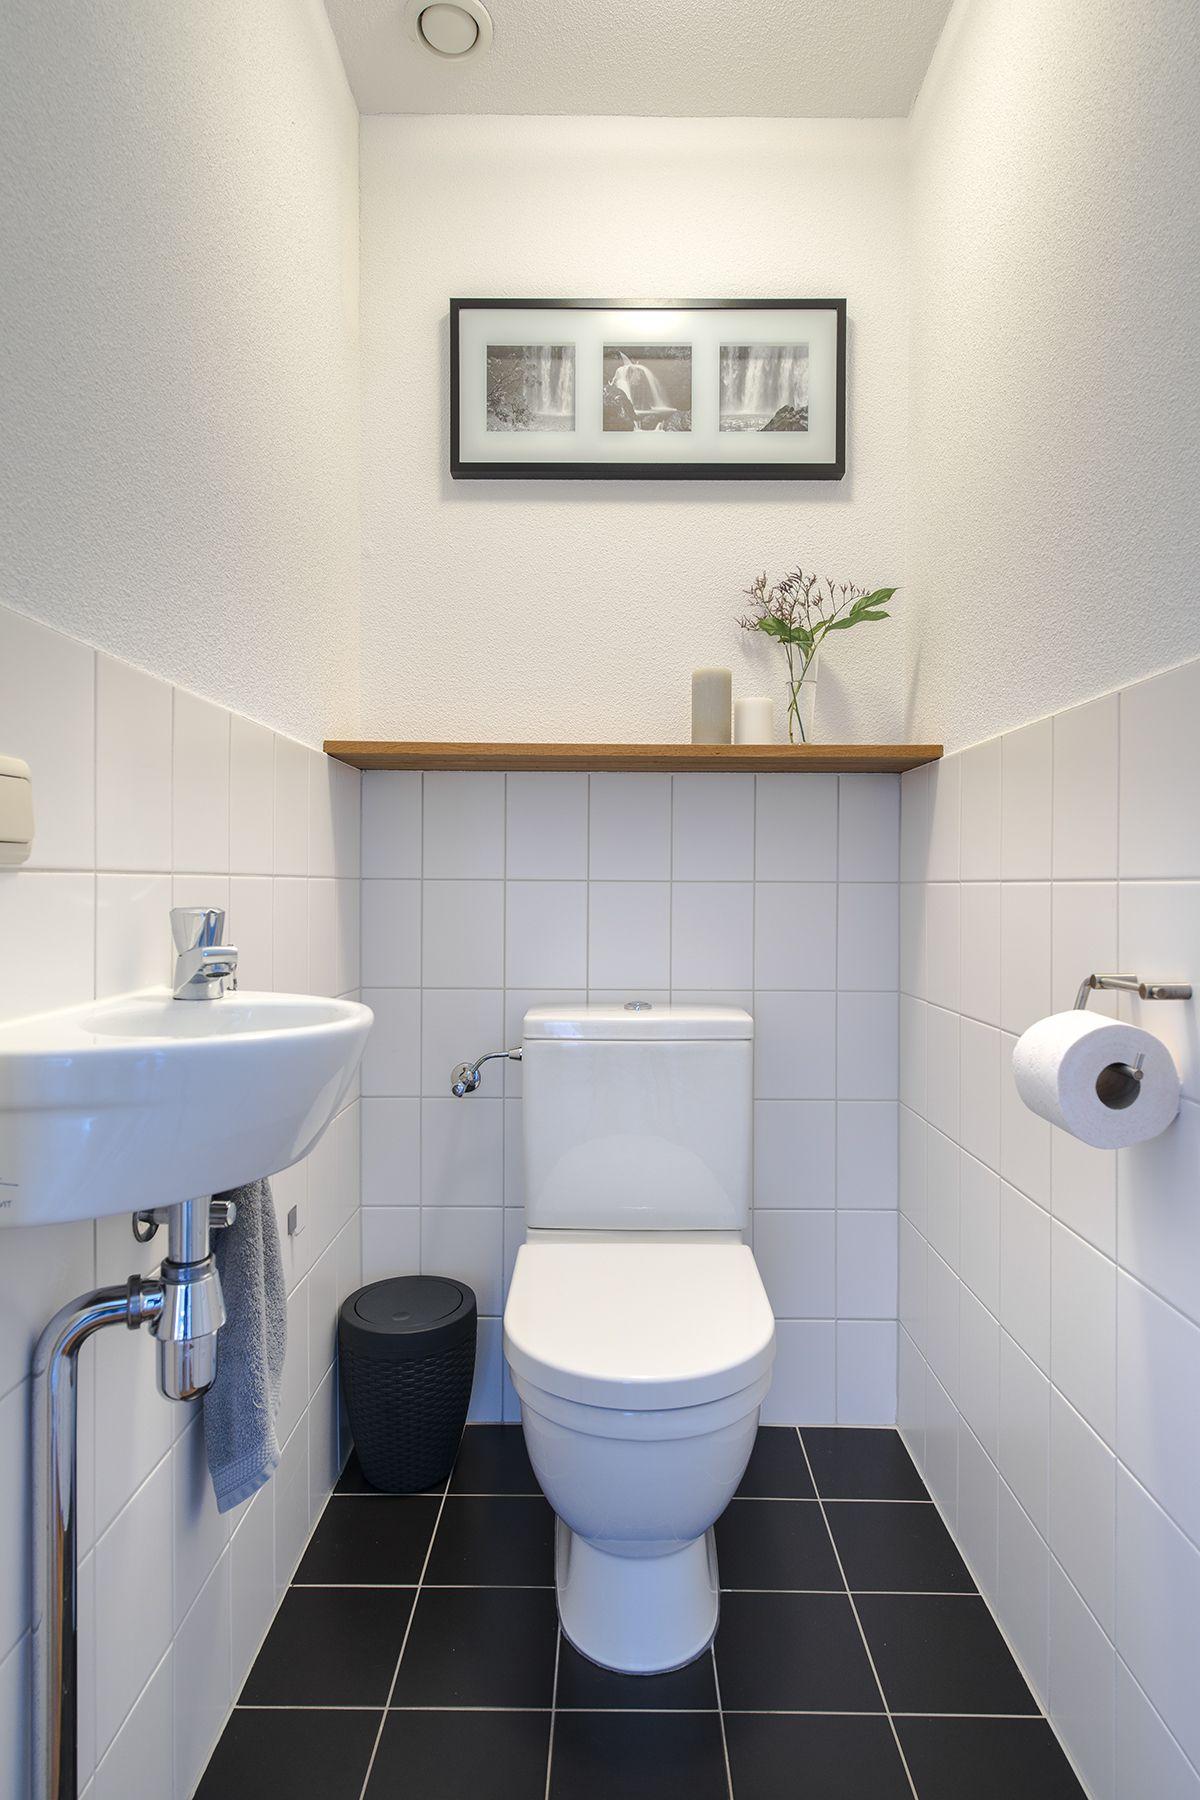 Seperate toilet Bathroom design decor, Bathroom tub